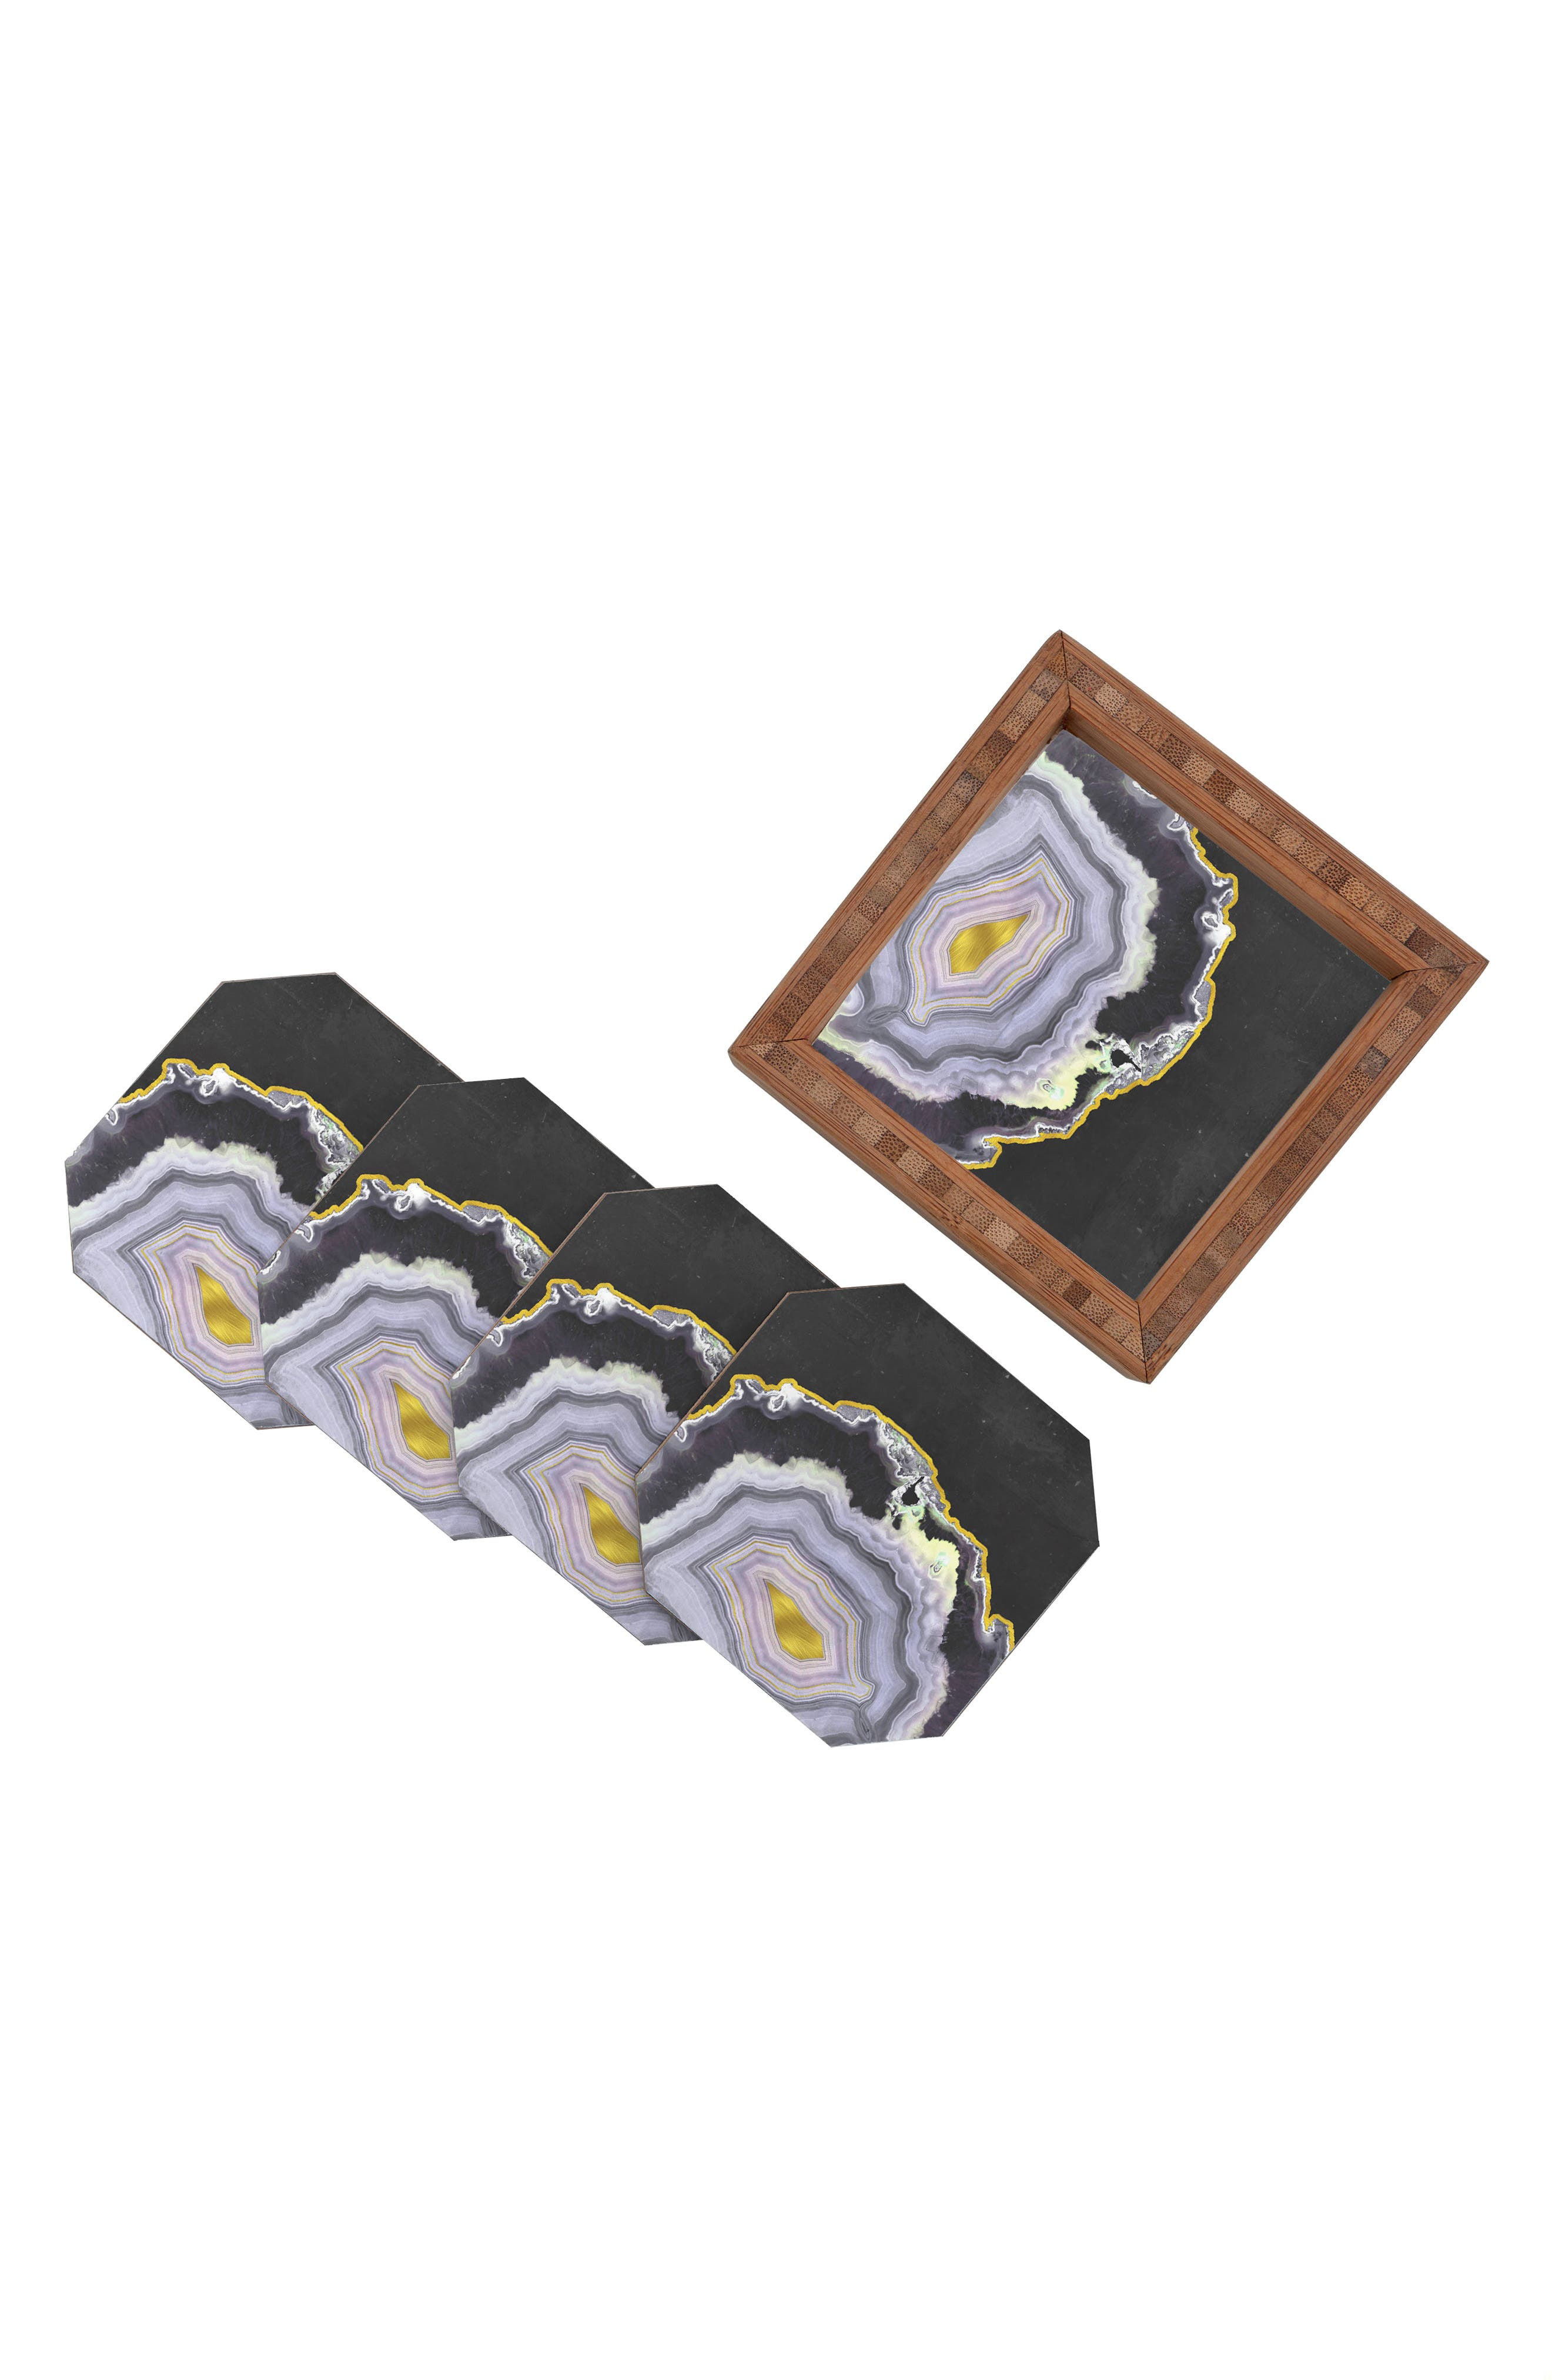 Black Agate Set of 4 Coasters,                             Alternate thumbnail 2, color,                             Multi